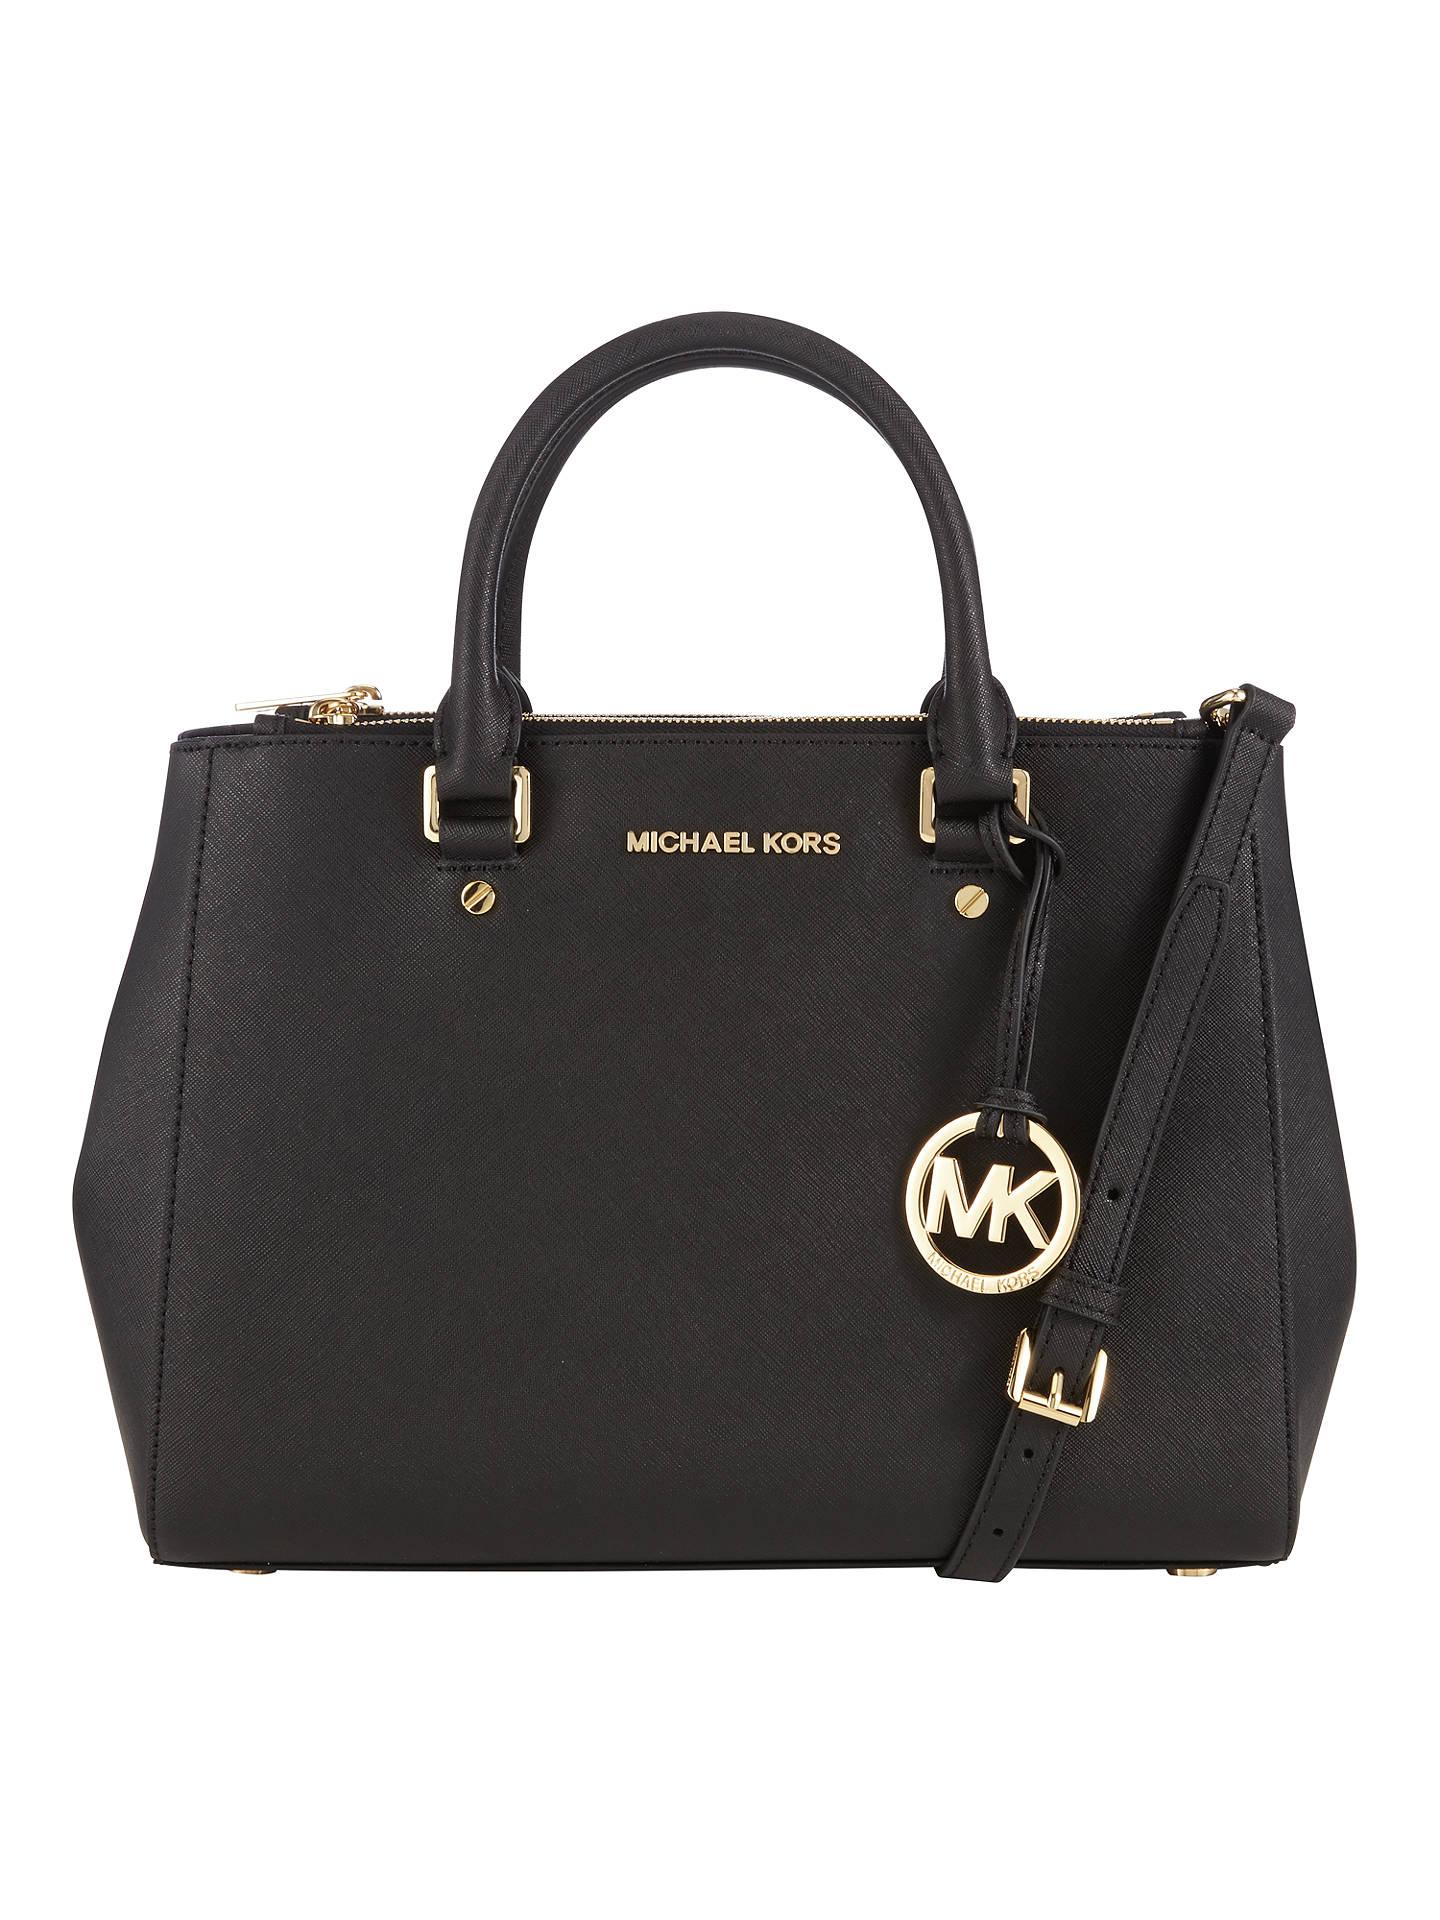 443561076a21 Buy MICHAEL Michael Kors Sutton Medium Leather Satchel Bag, Black Online at  johnlewis.com ...